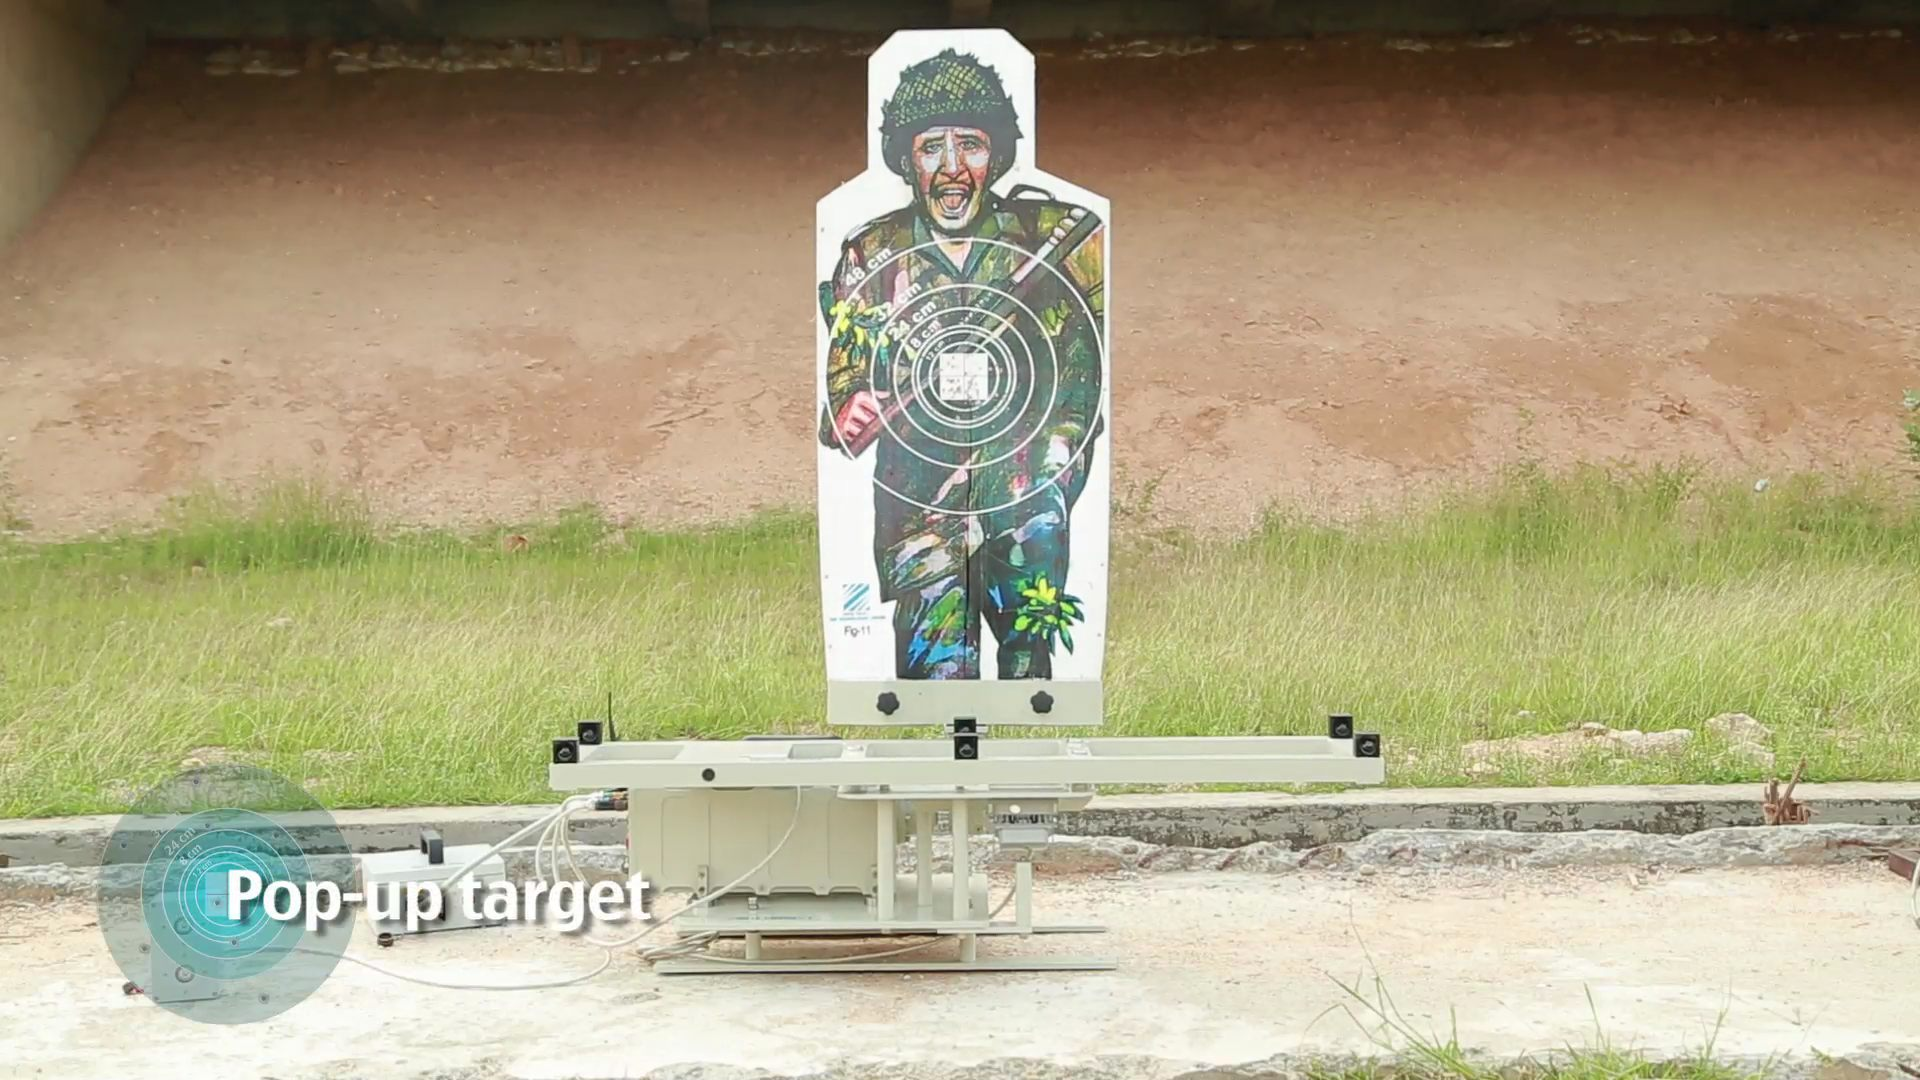 sts-pop-up-target